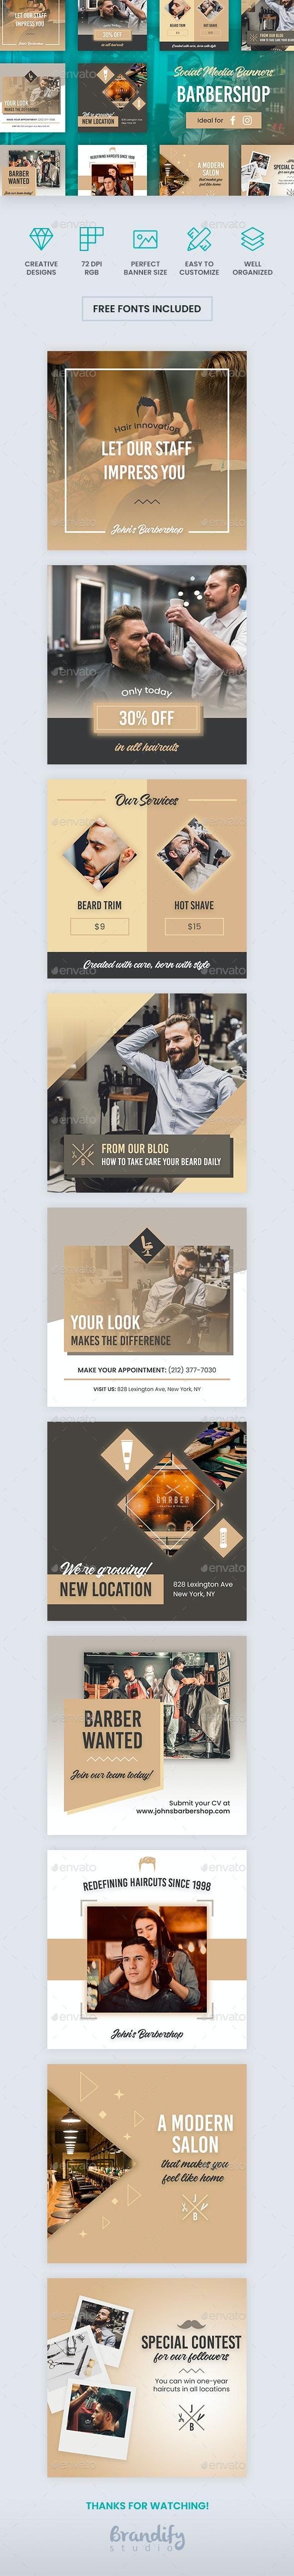 Barbershop Banners - Social Media Web Elements